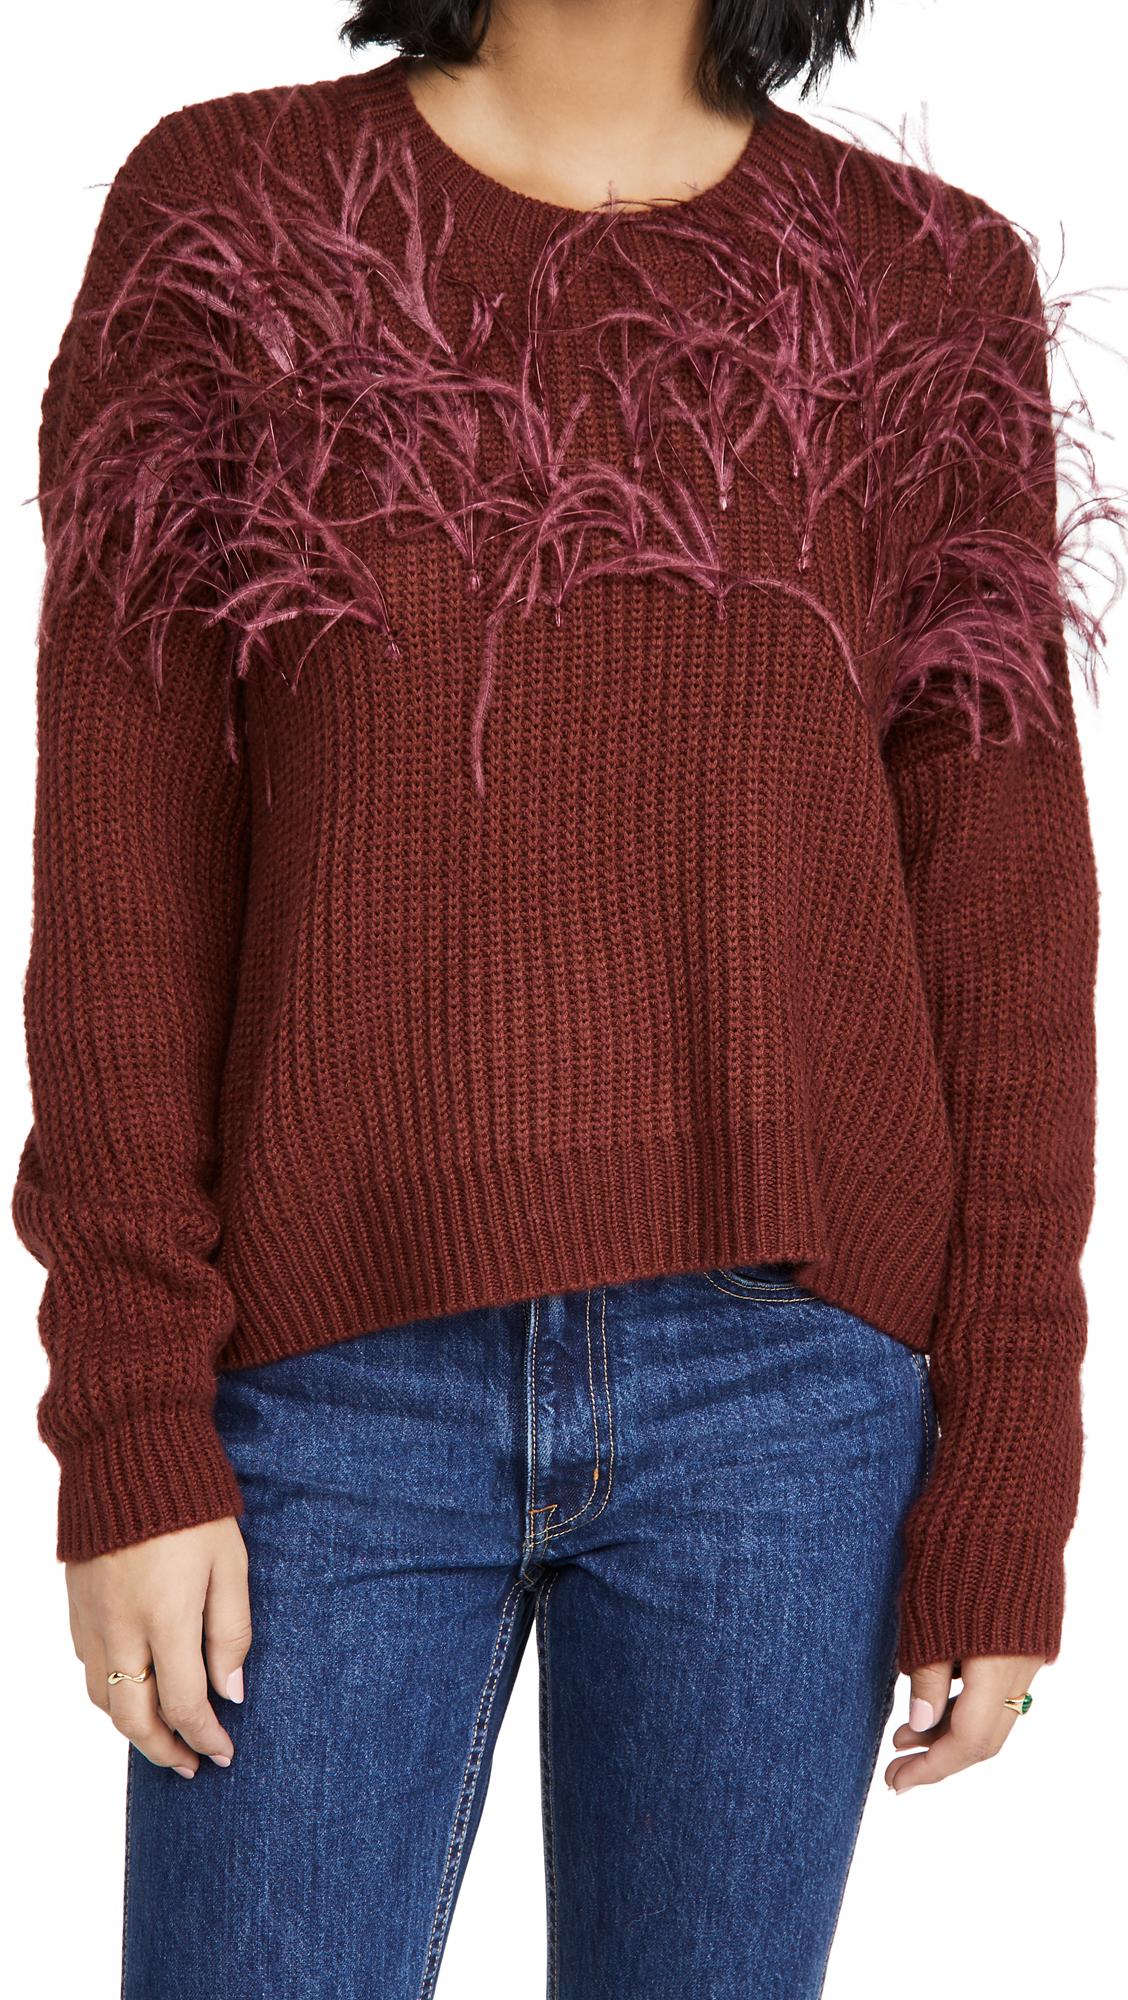 Cinq À Sept Wools MELANIE SWEATER